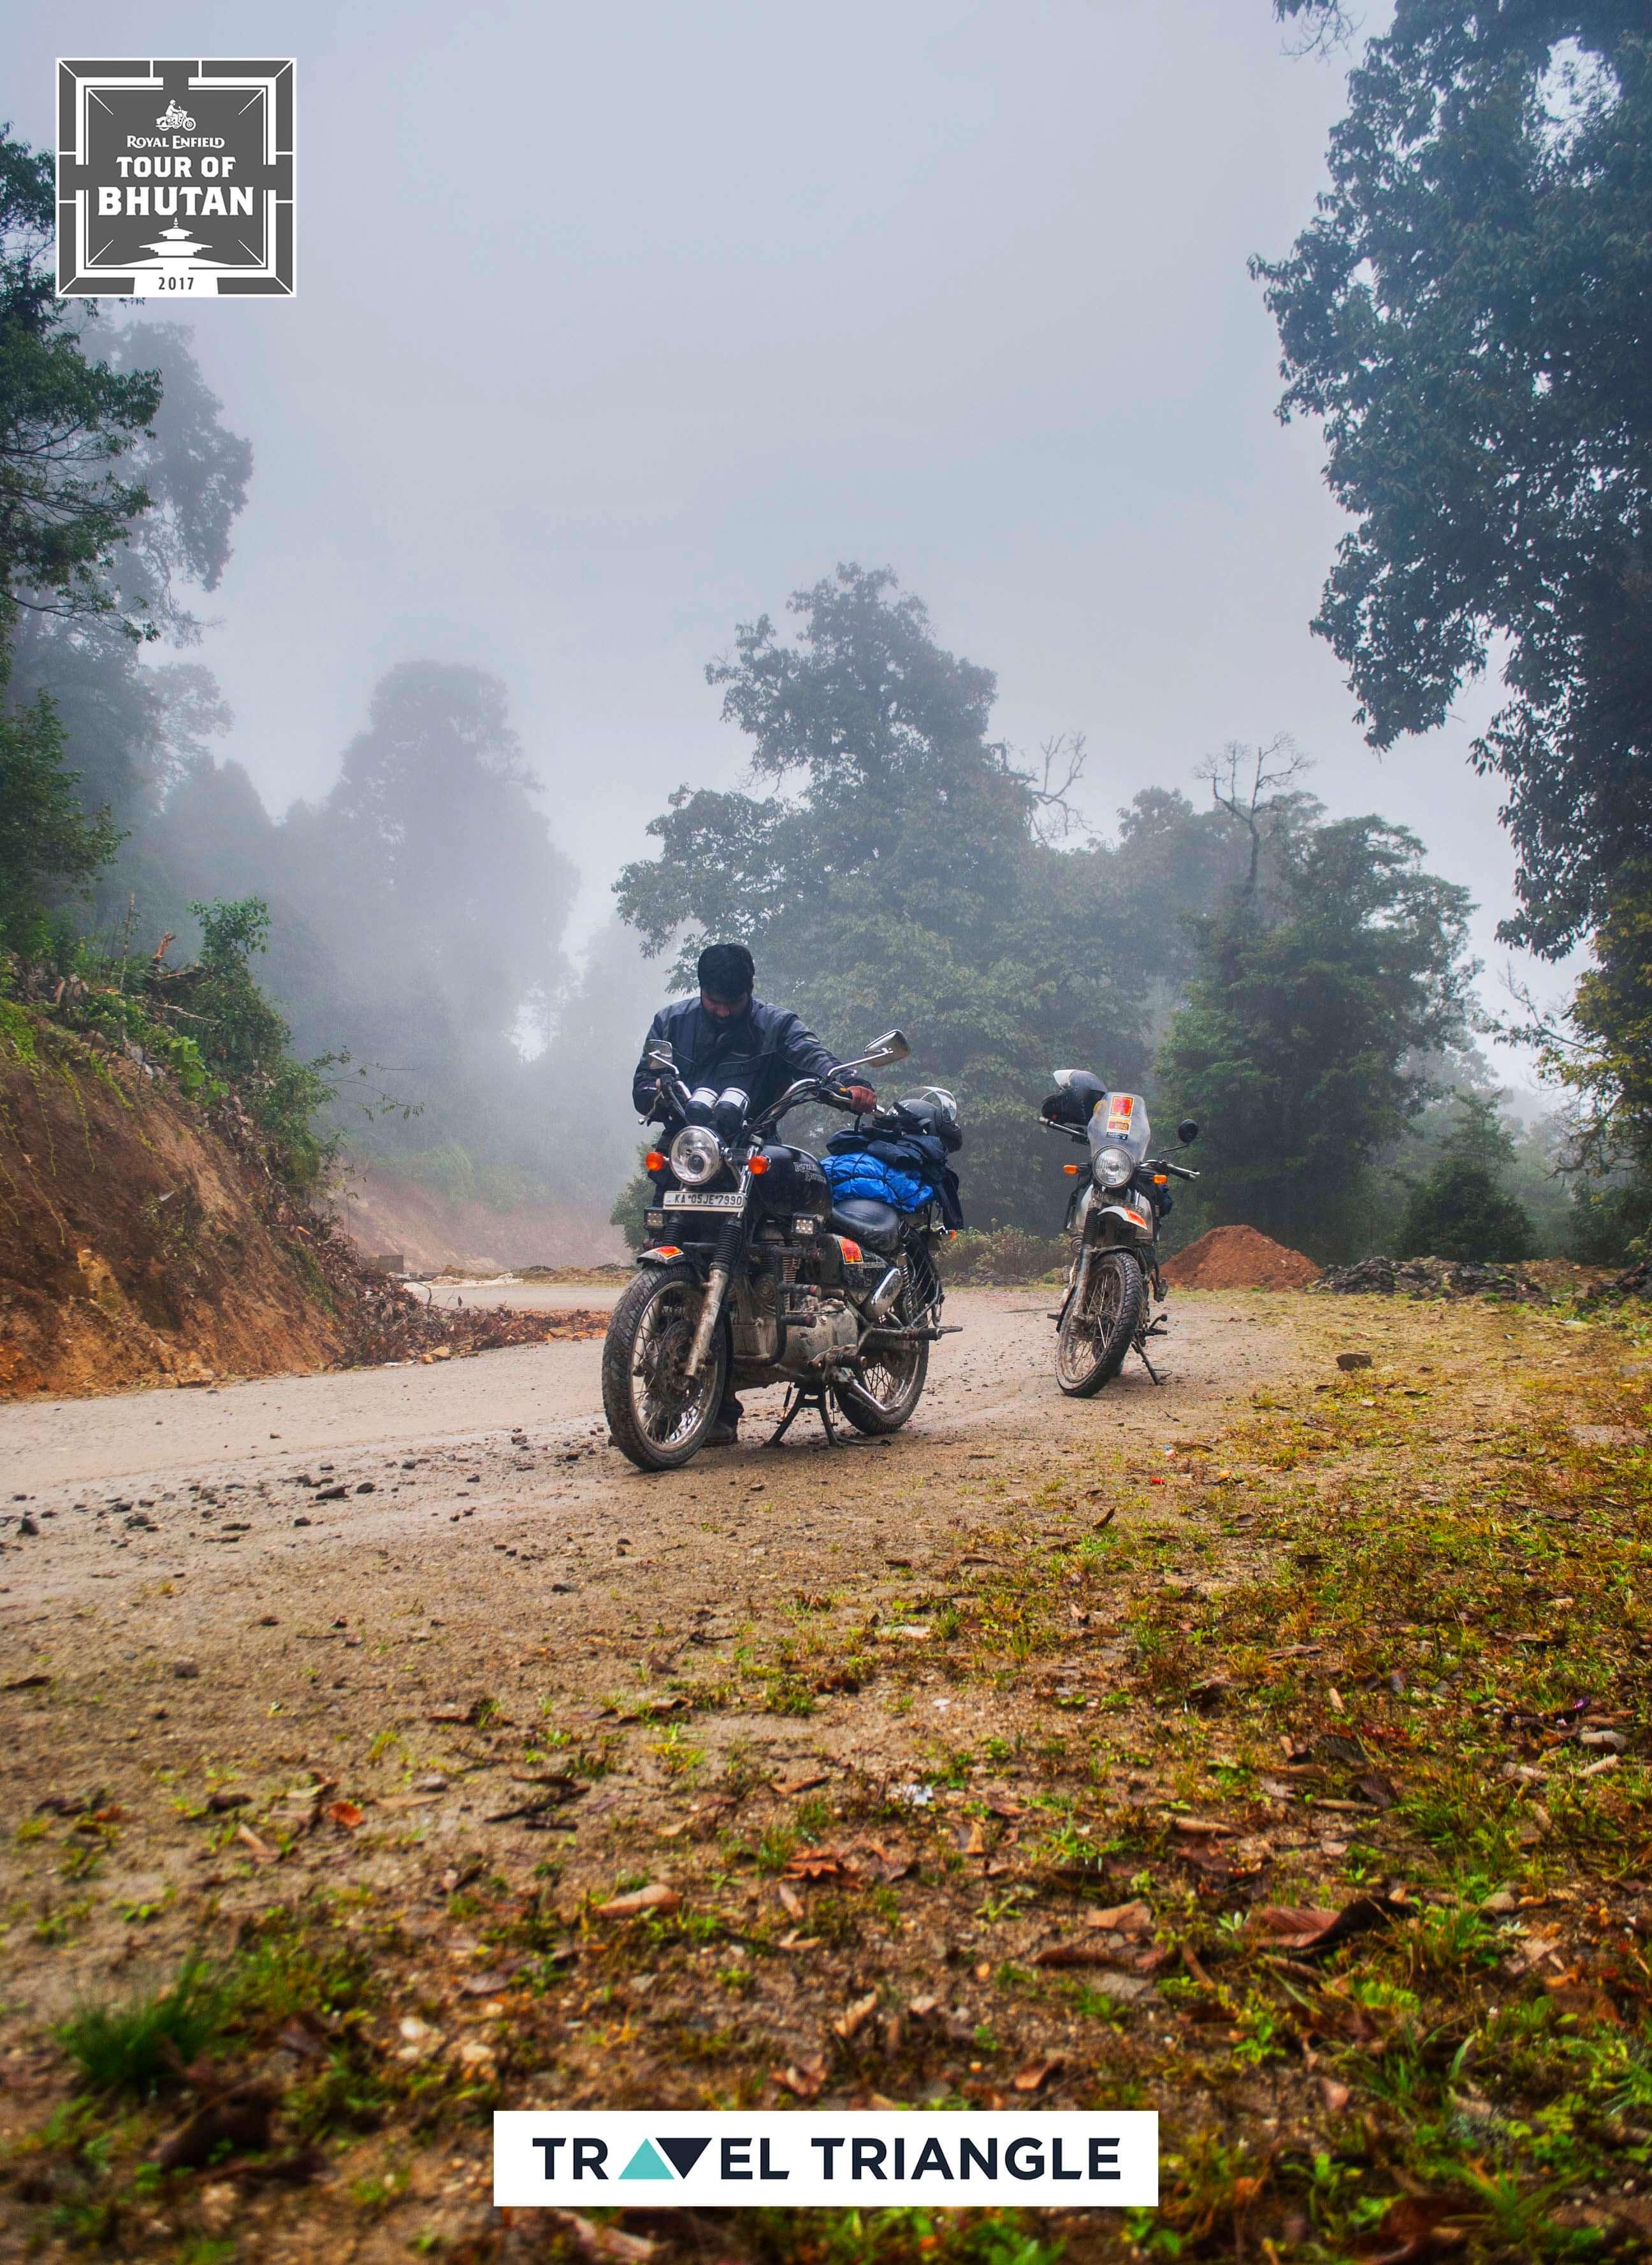 Mongar to Trashigang: treading through the tough muck